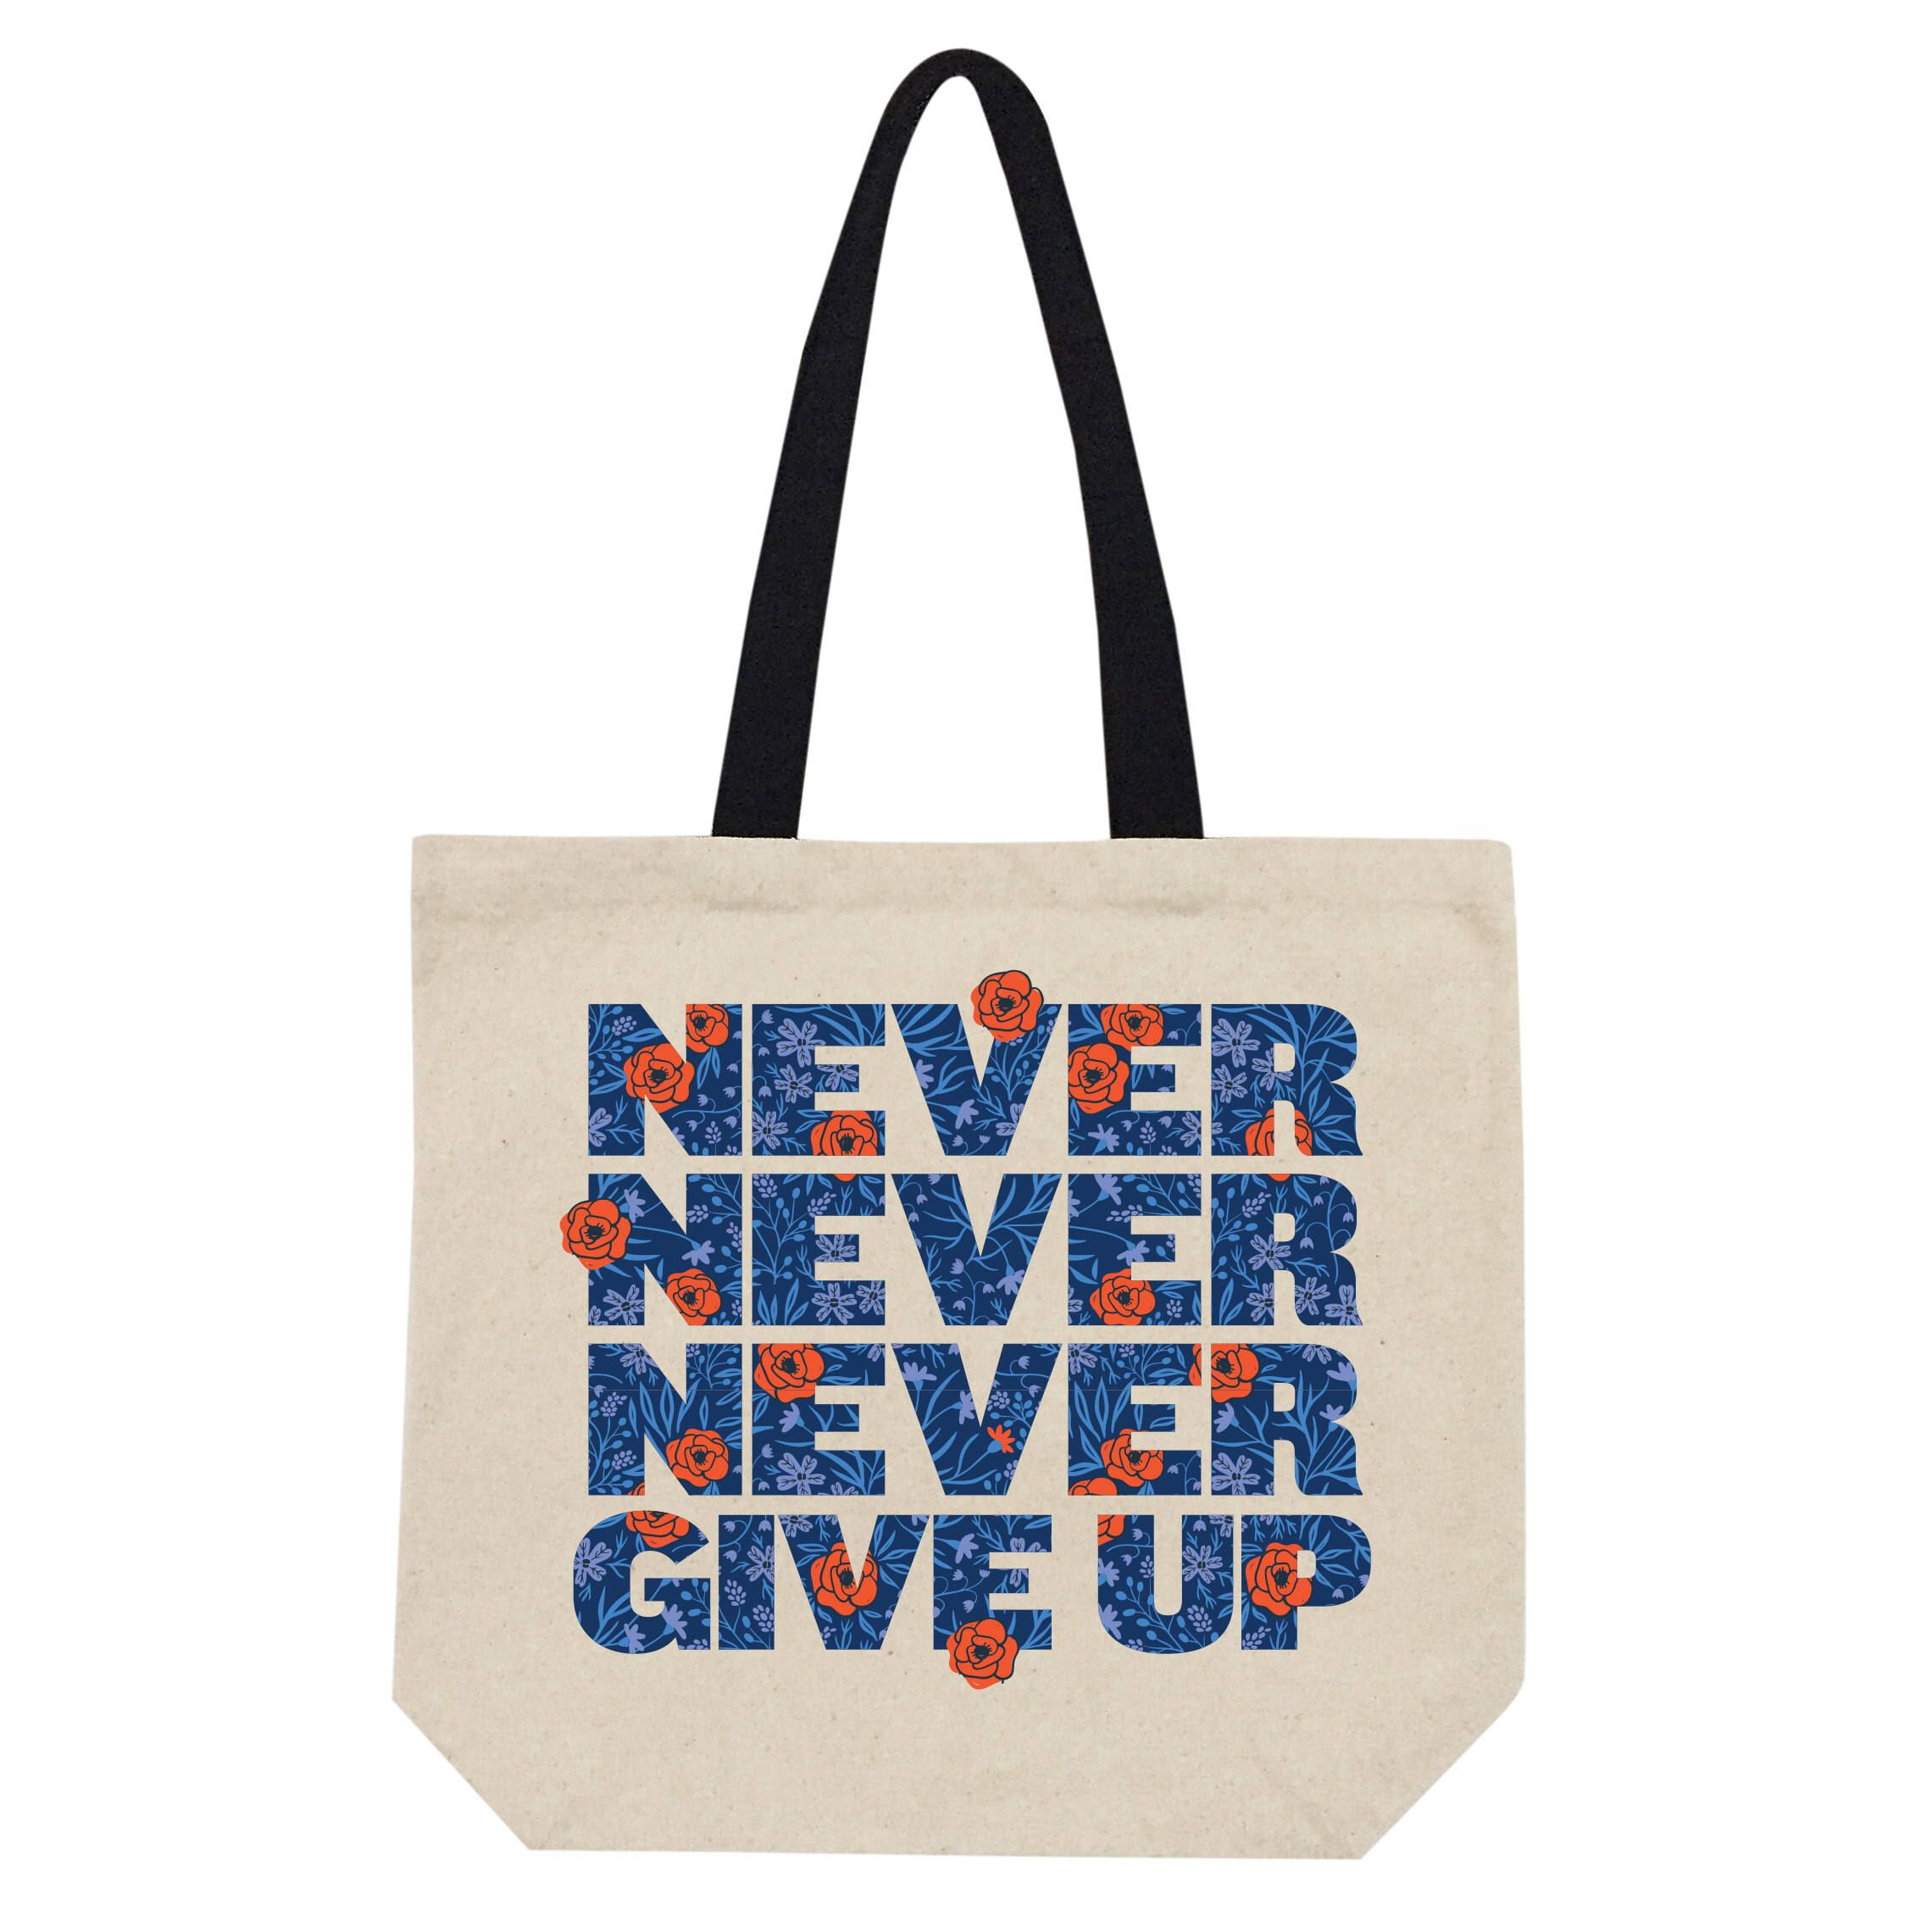 Never, never, never give up... New design for hard days.  #etsy #sanvalentin #shoppingtotebag #bookstotebag #beachtotebag #positivequotebag